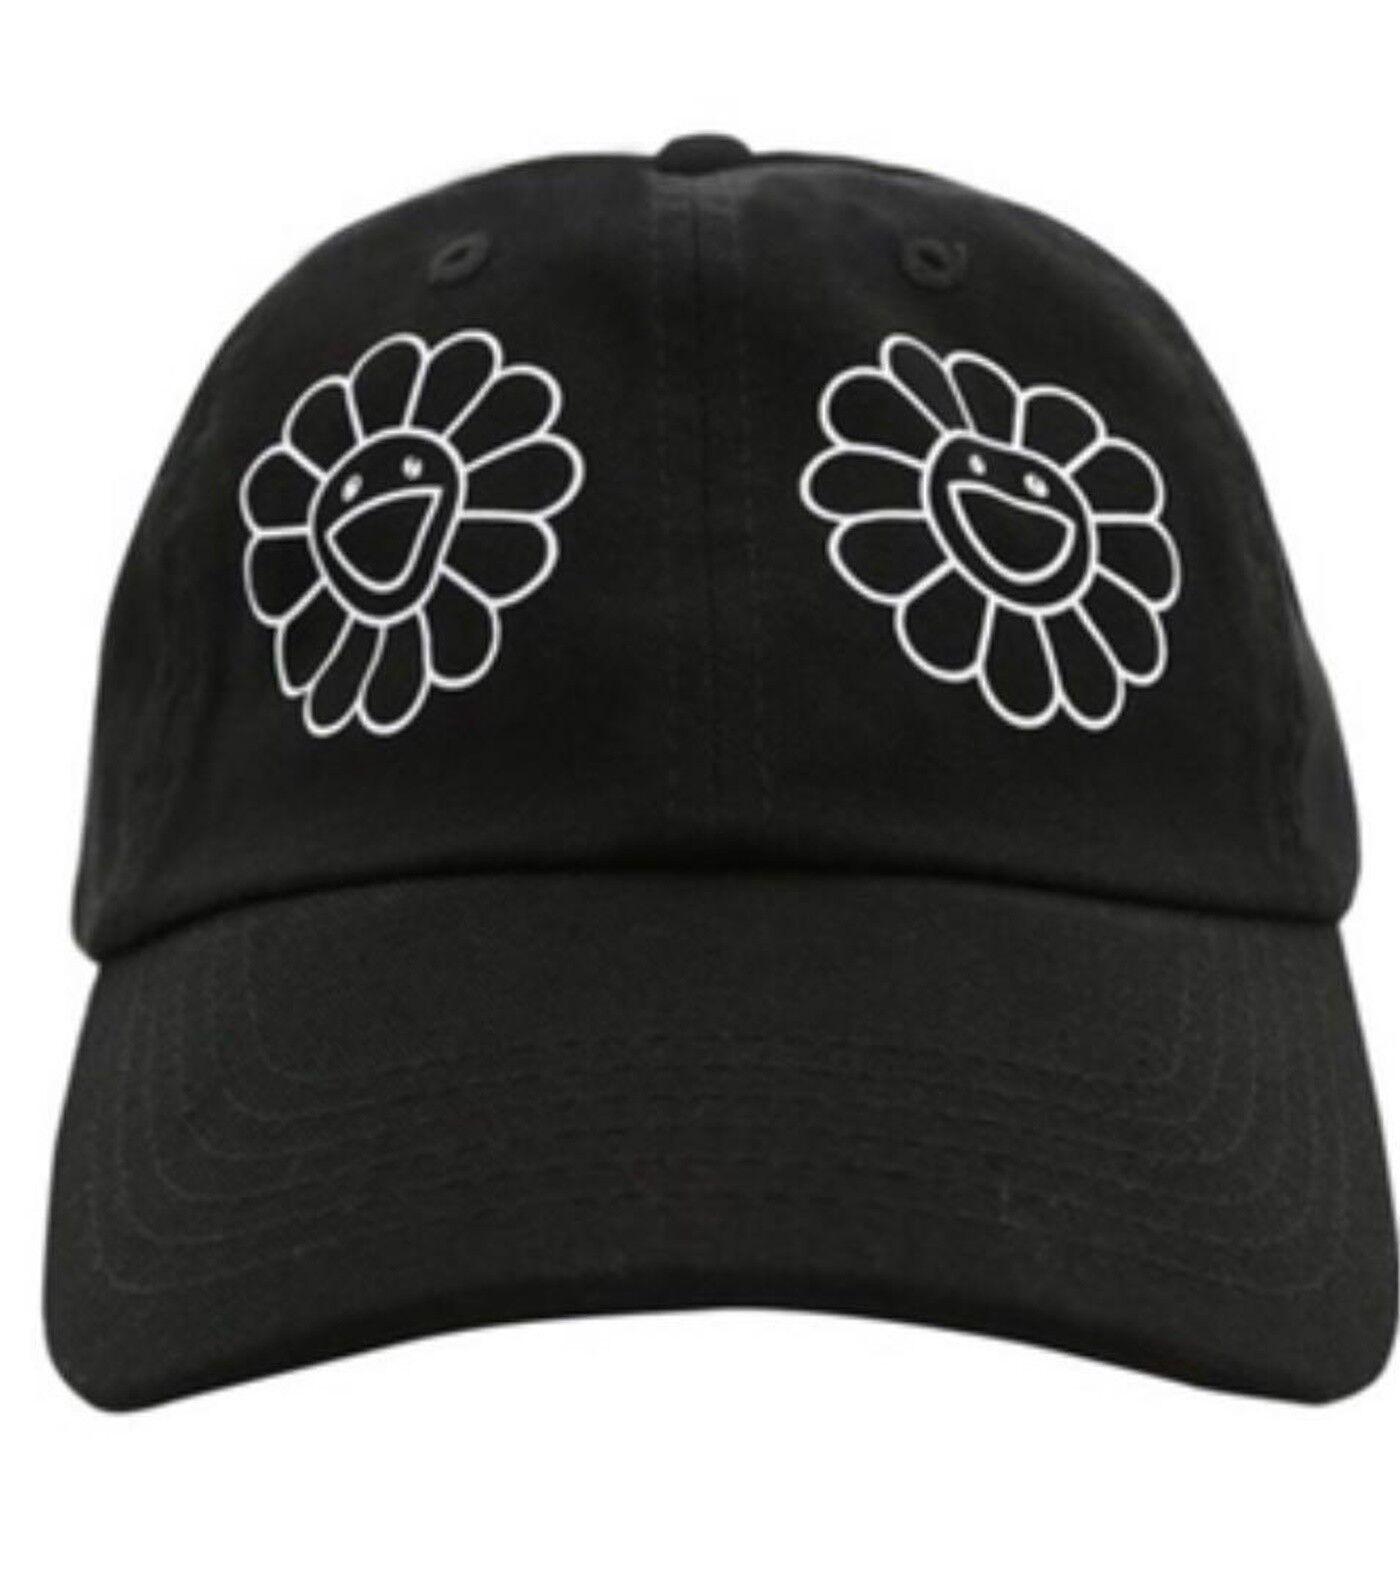 Complexcon Limited Murakami Takashi  Design Flower Cap F S JAPAN  cheap designer brands